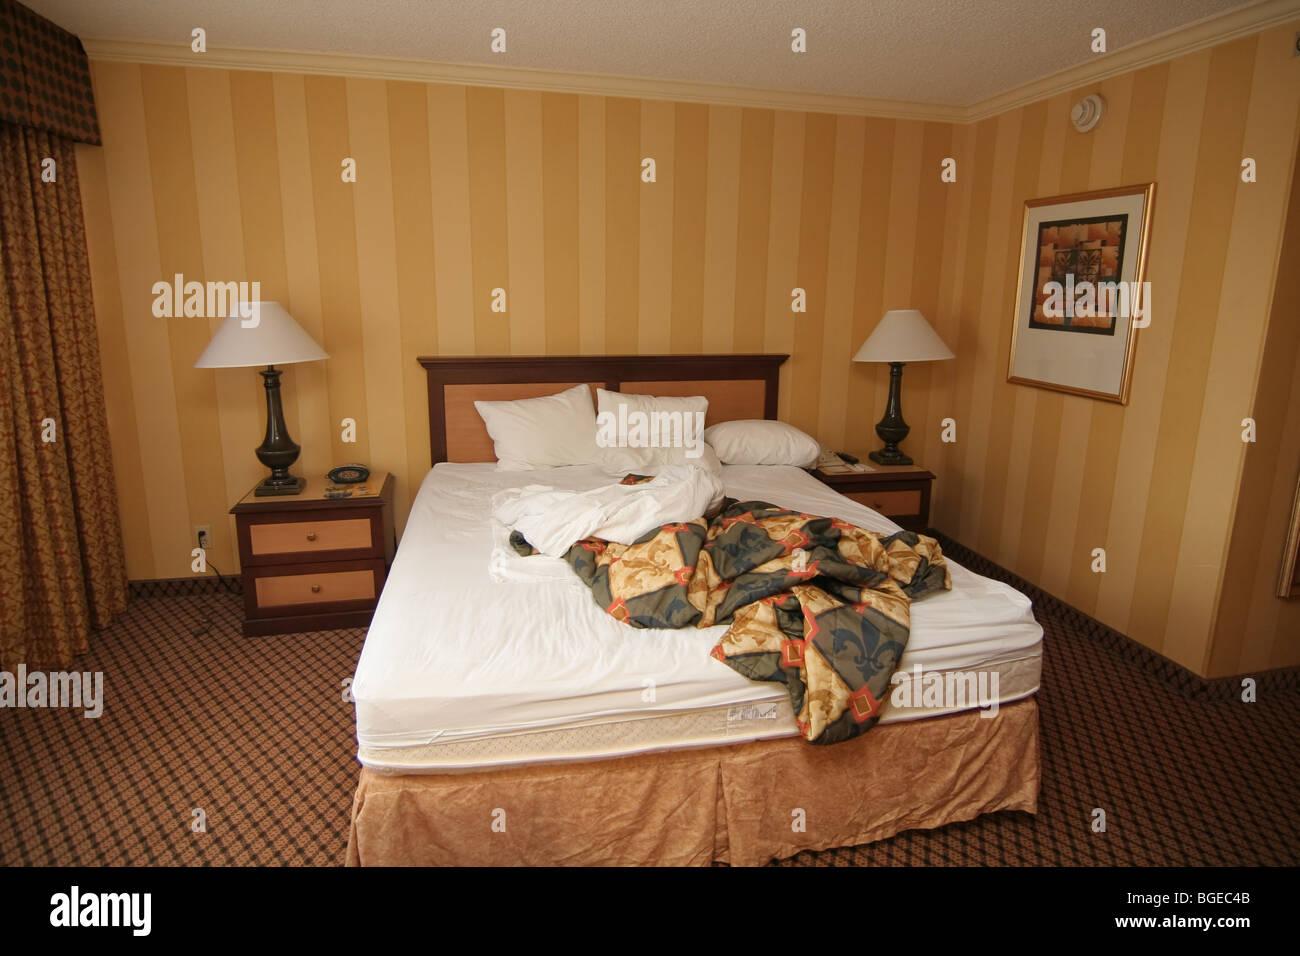 Messy Hotel Room Bed Holiday Inn LA